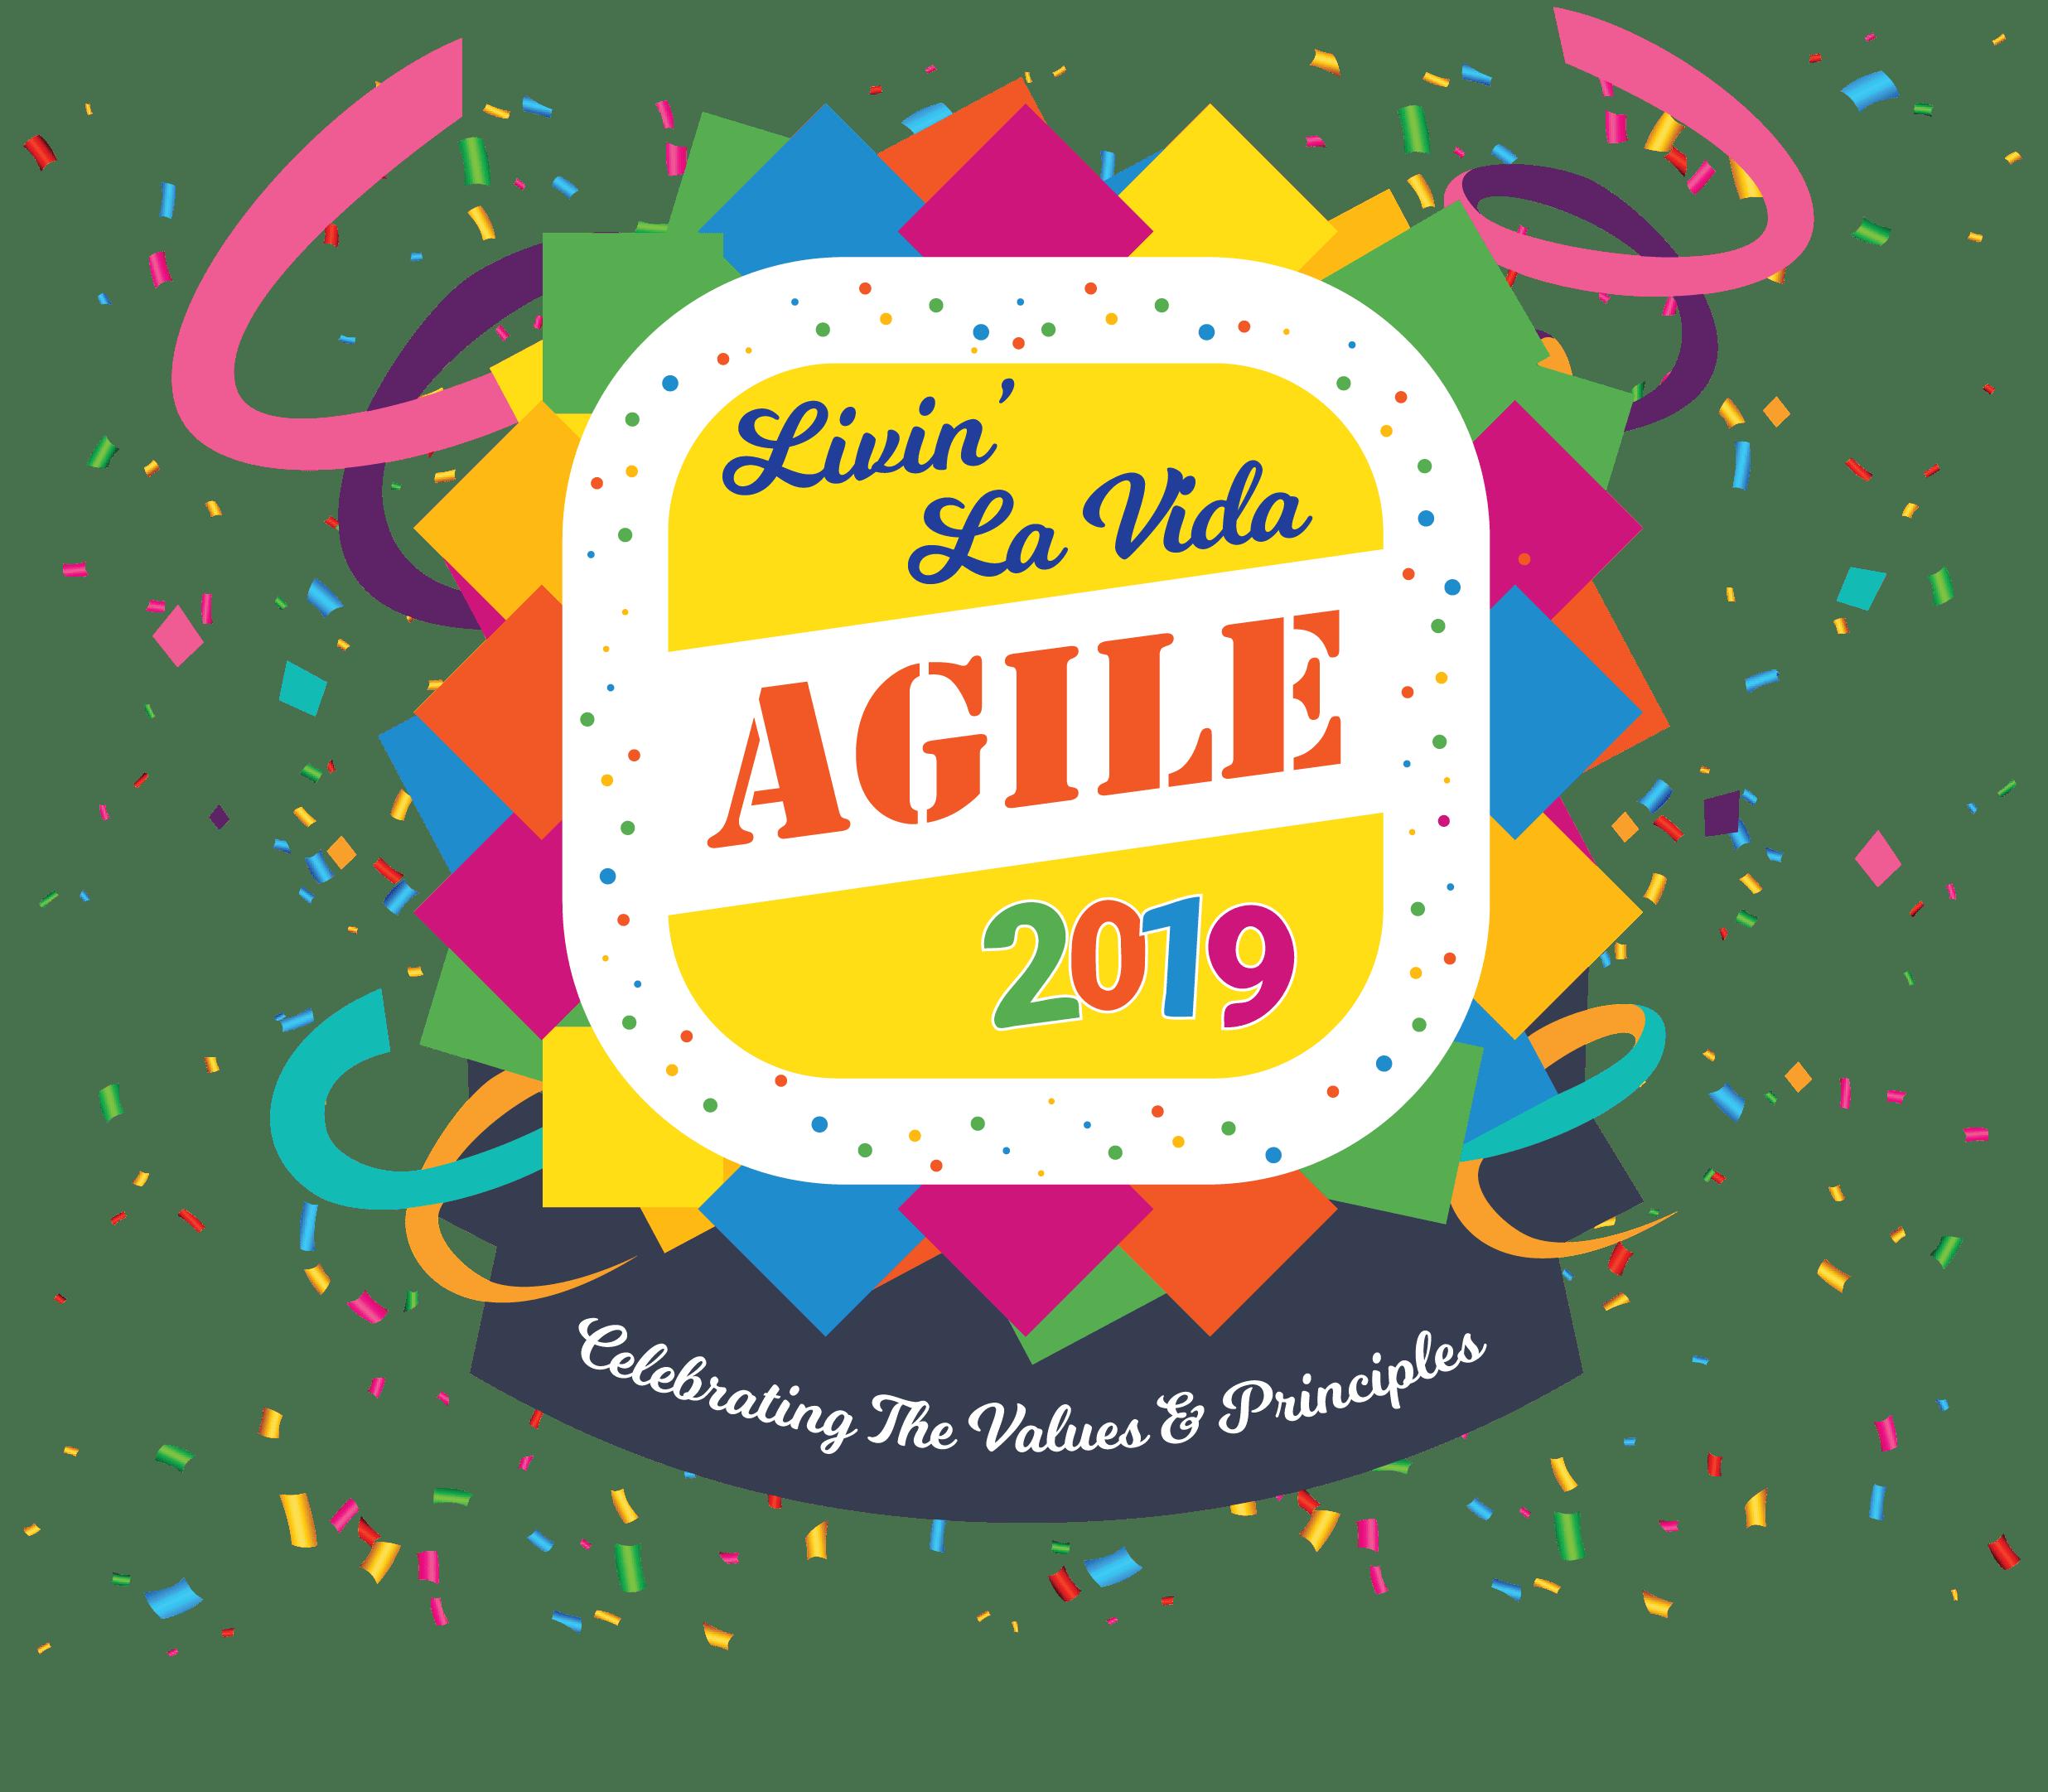 agile-open-florida-2019-logo-bg-min